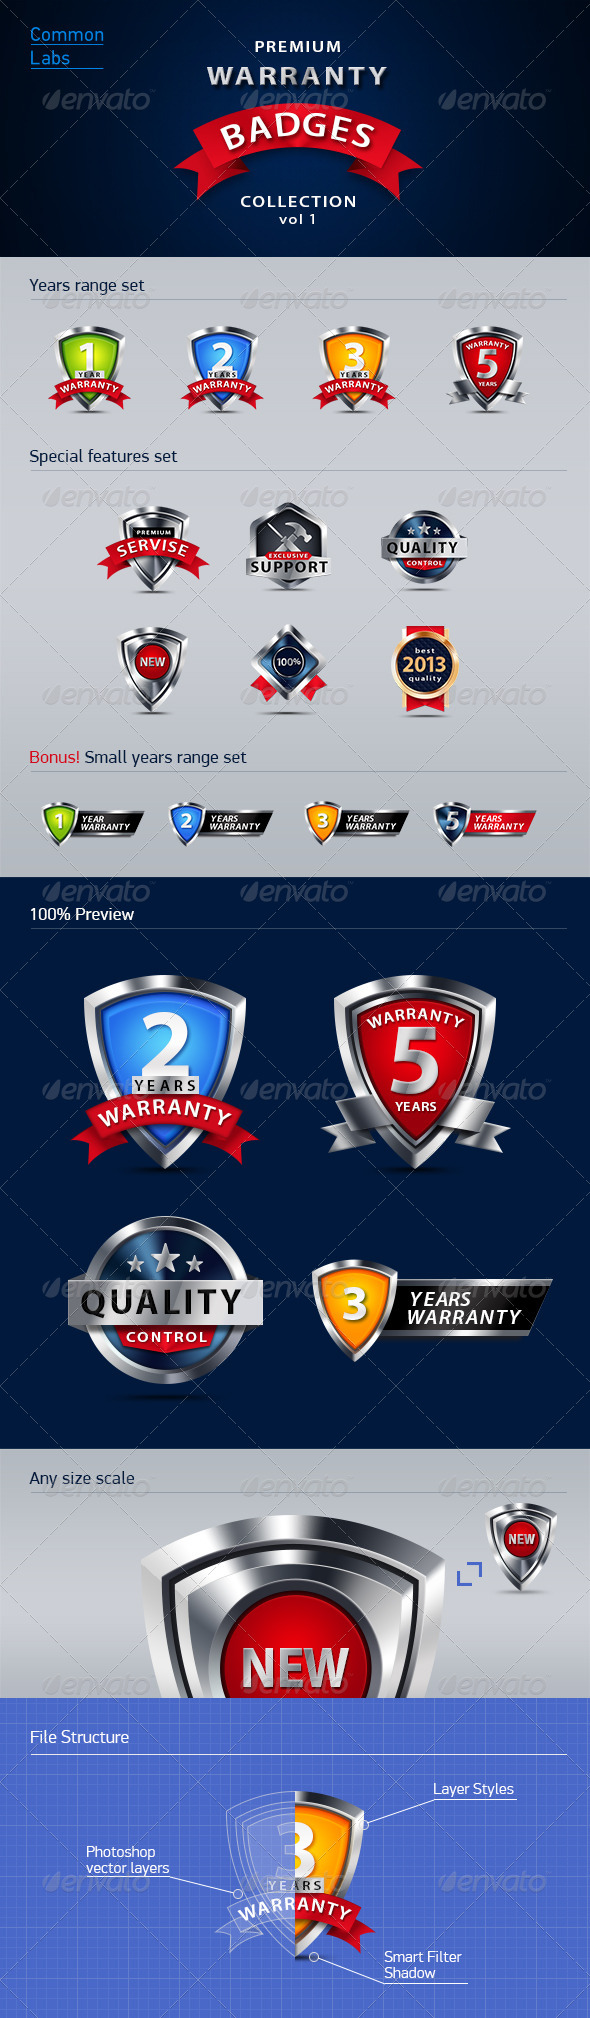 GraphicRiver Premium Warranty Badges Collection Vol 1 4481503